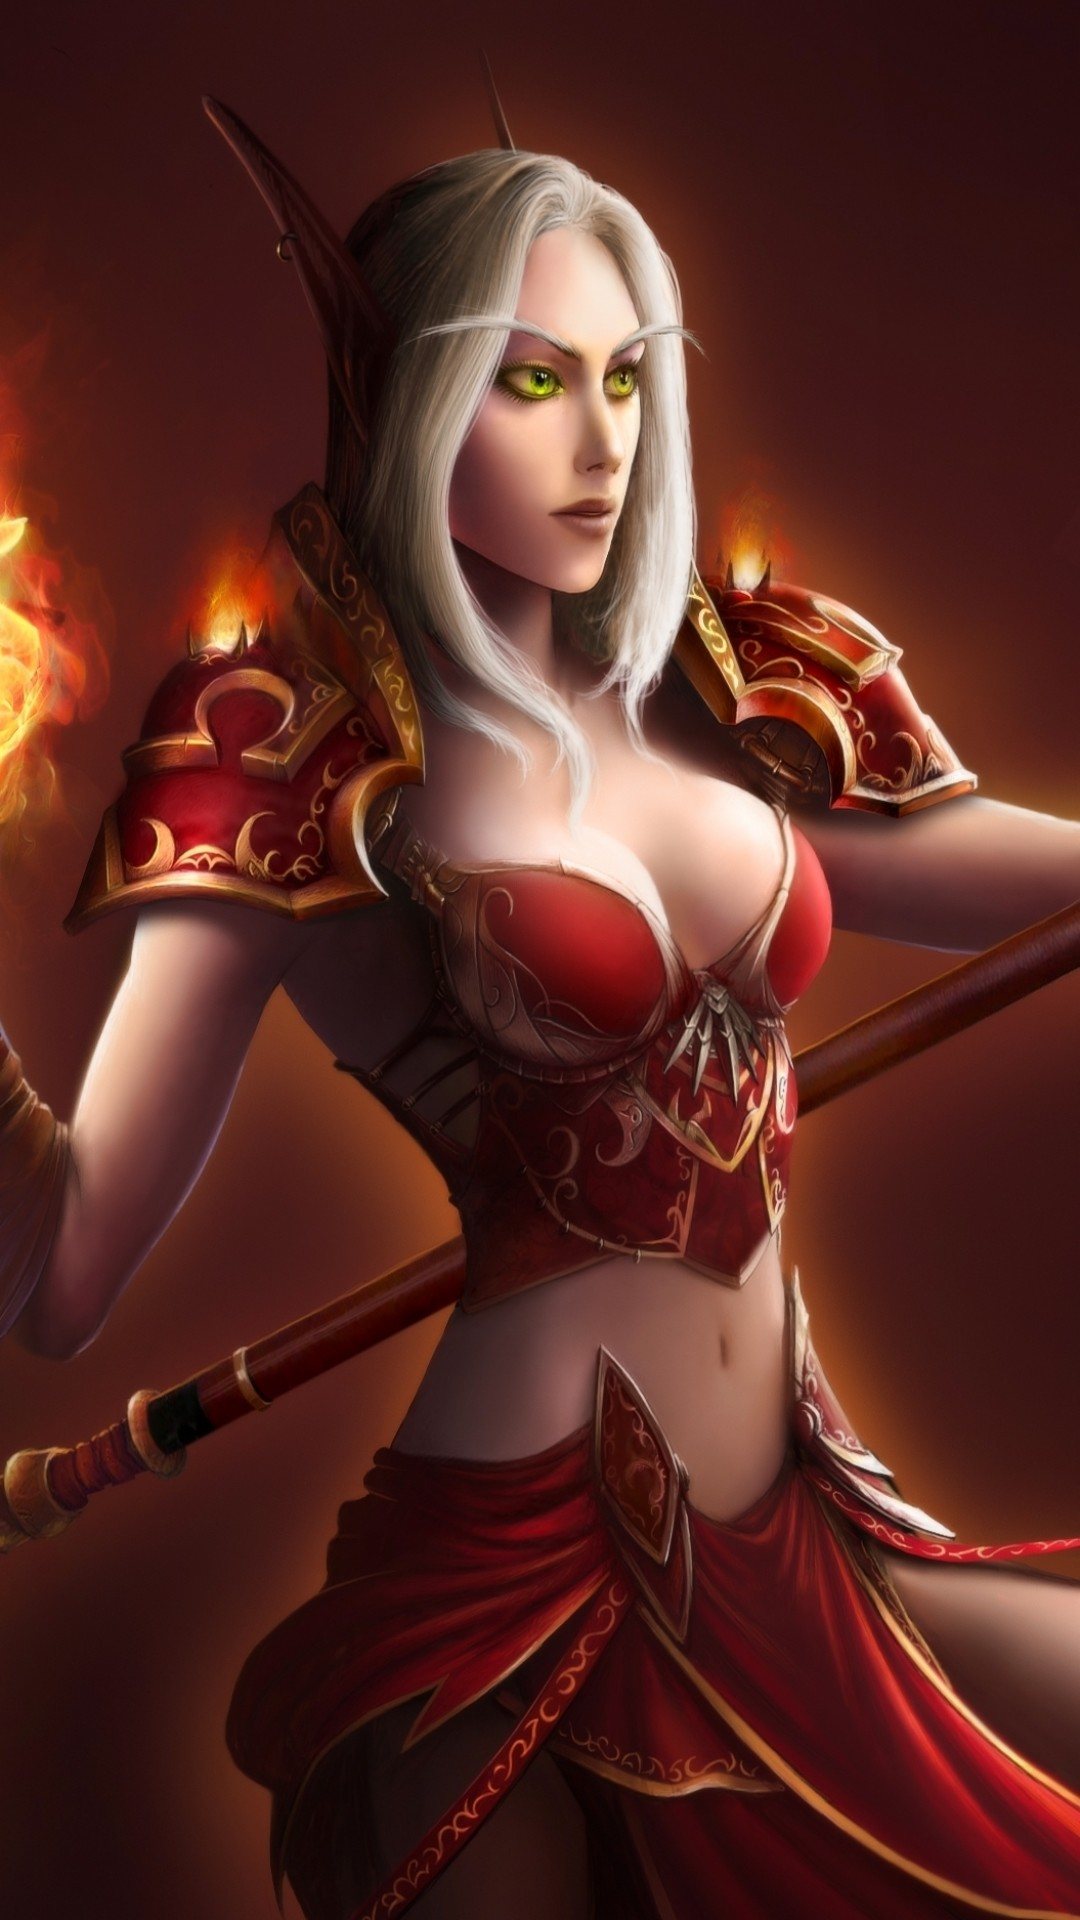 [47+] Fantasy Female Warrior Wallpapers on WallpaperSafari